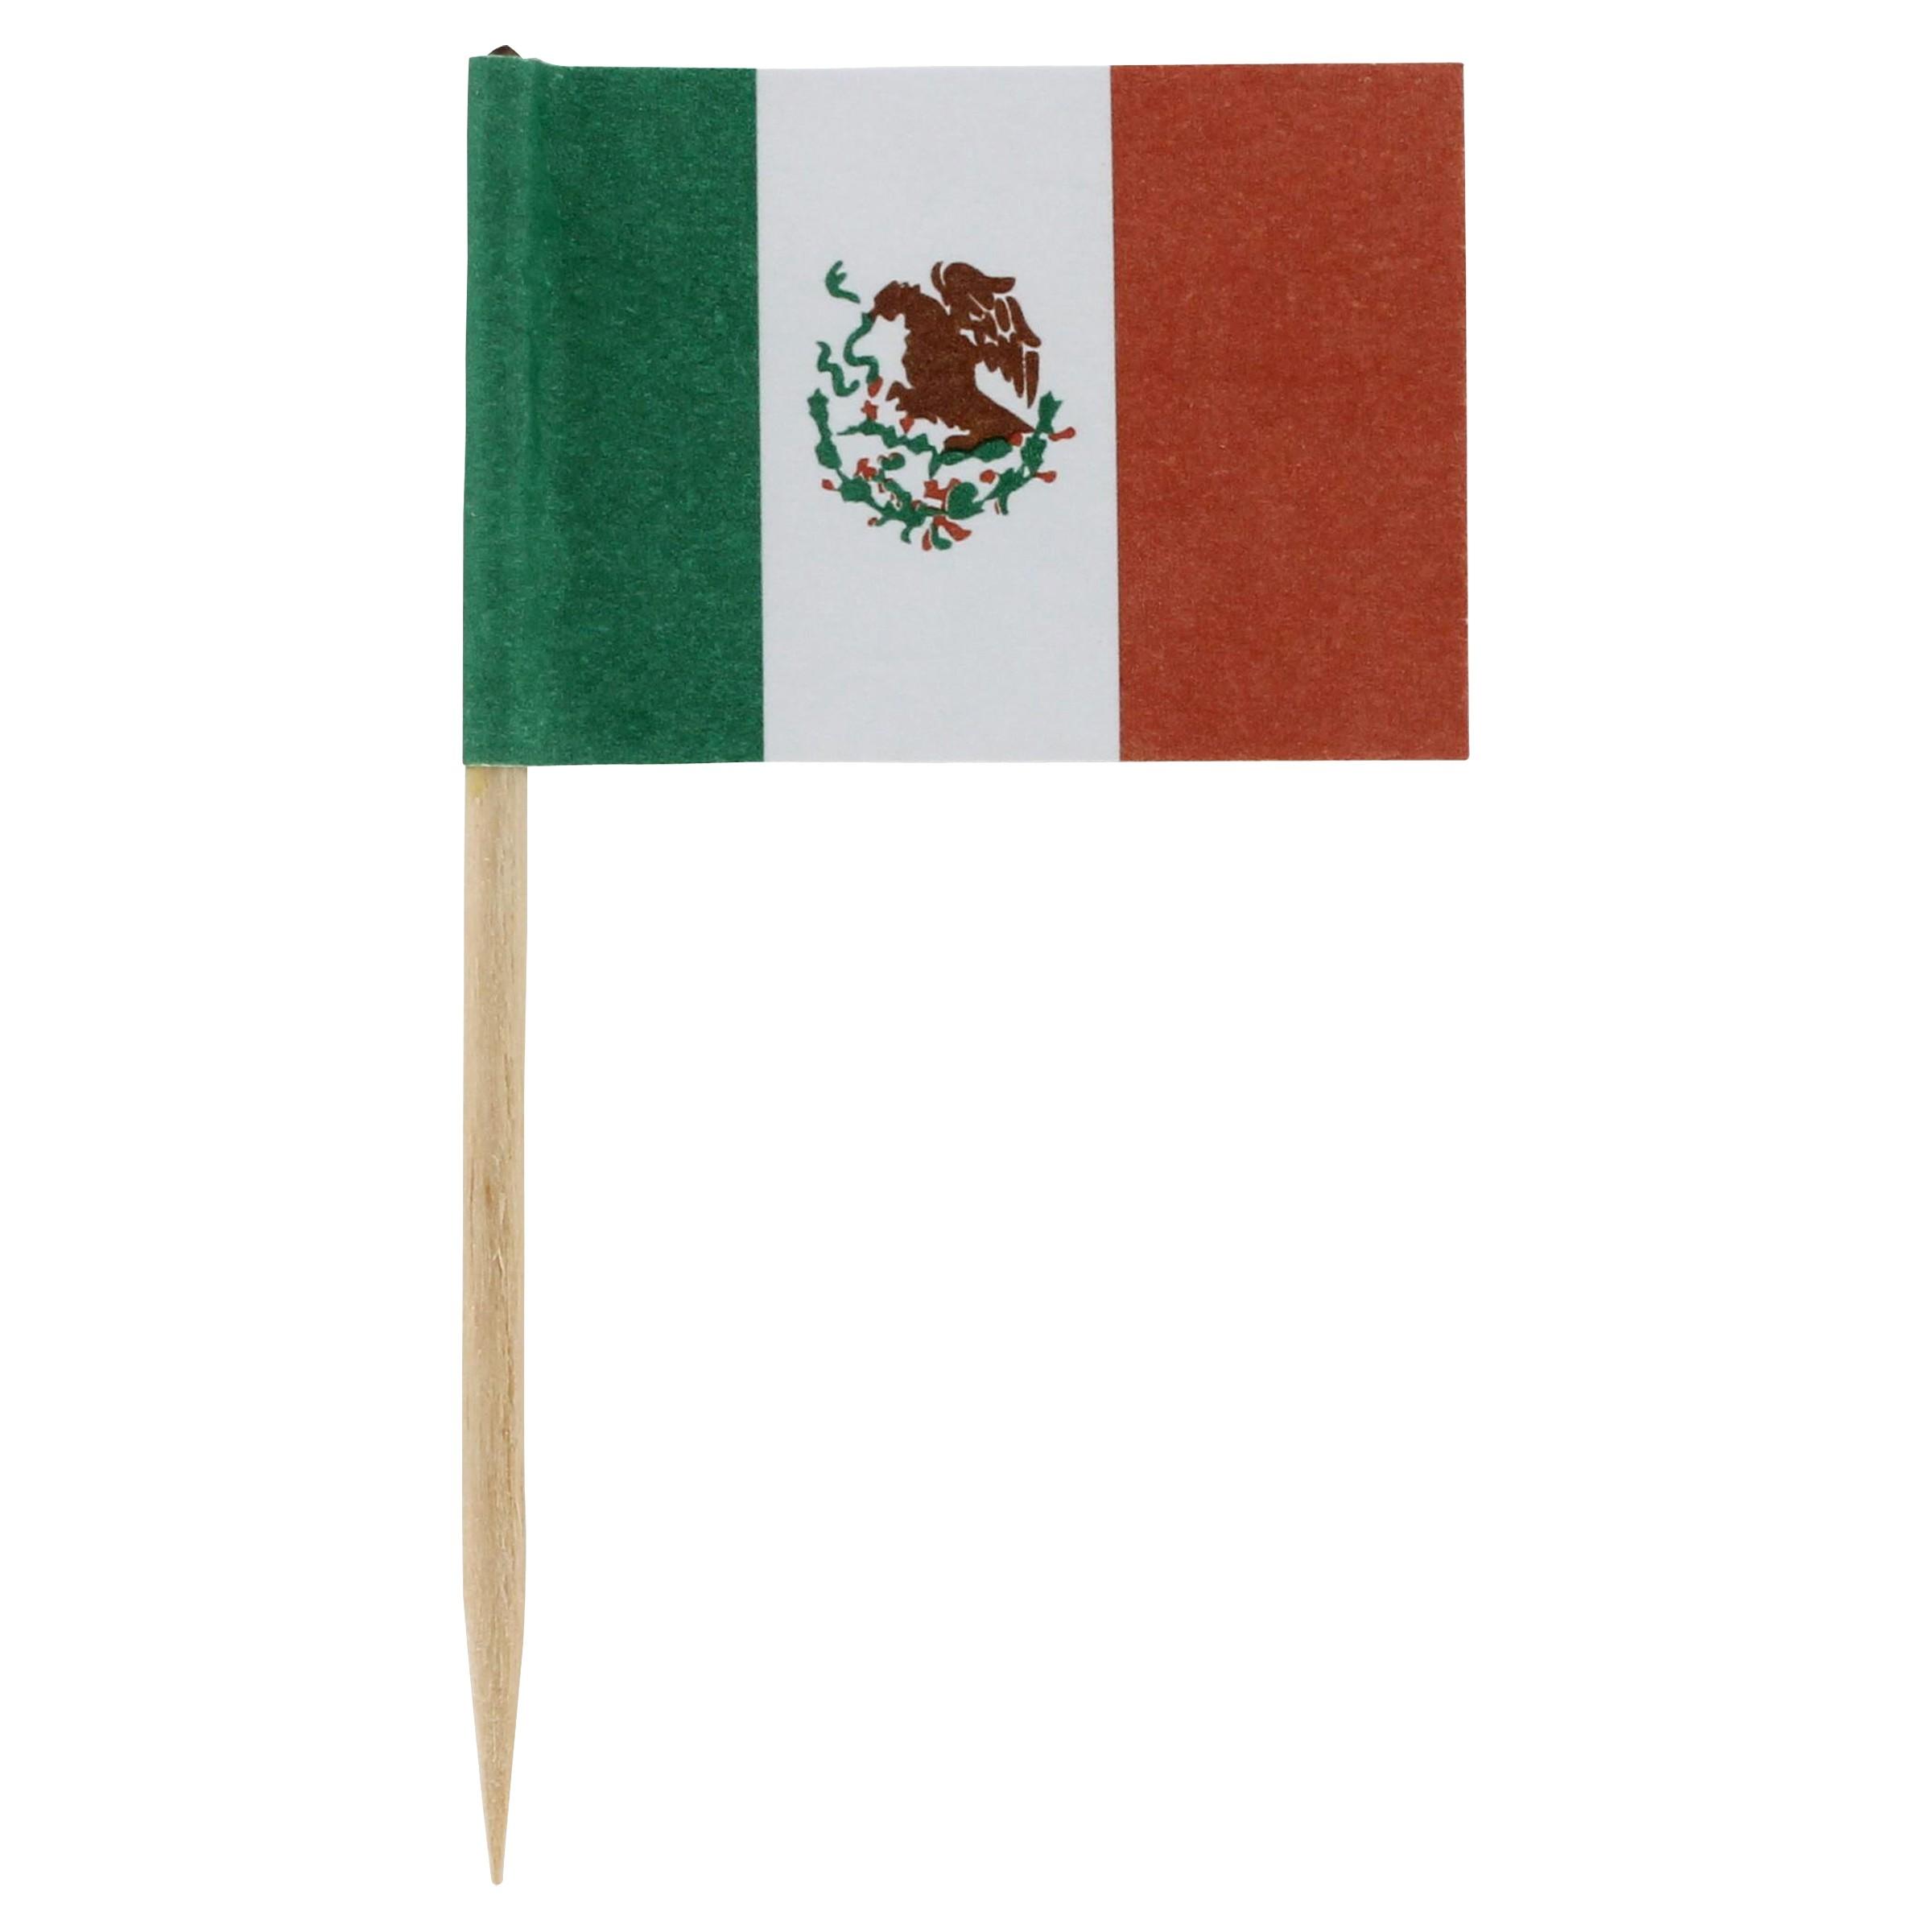 Mexico Flag Clip Art Clipart Best-Mexico Flag Clip Art Clipart Best-16